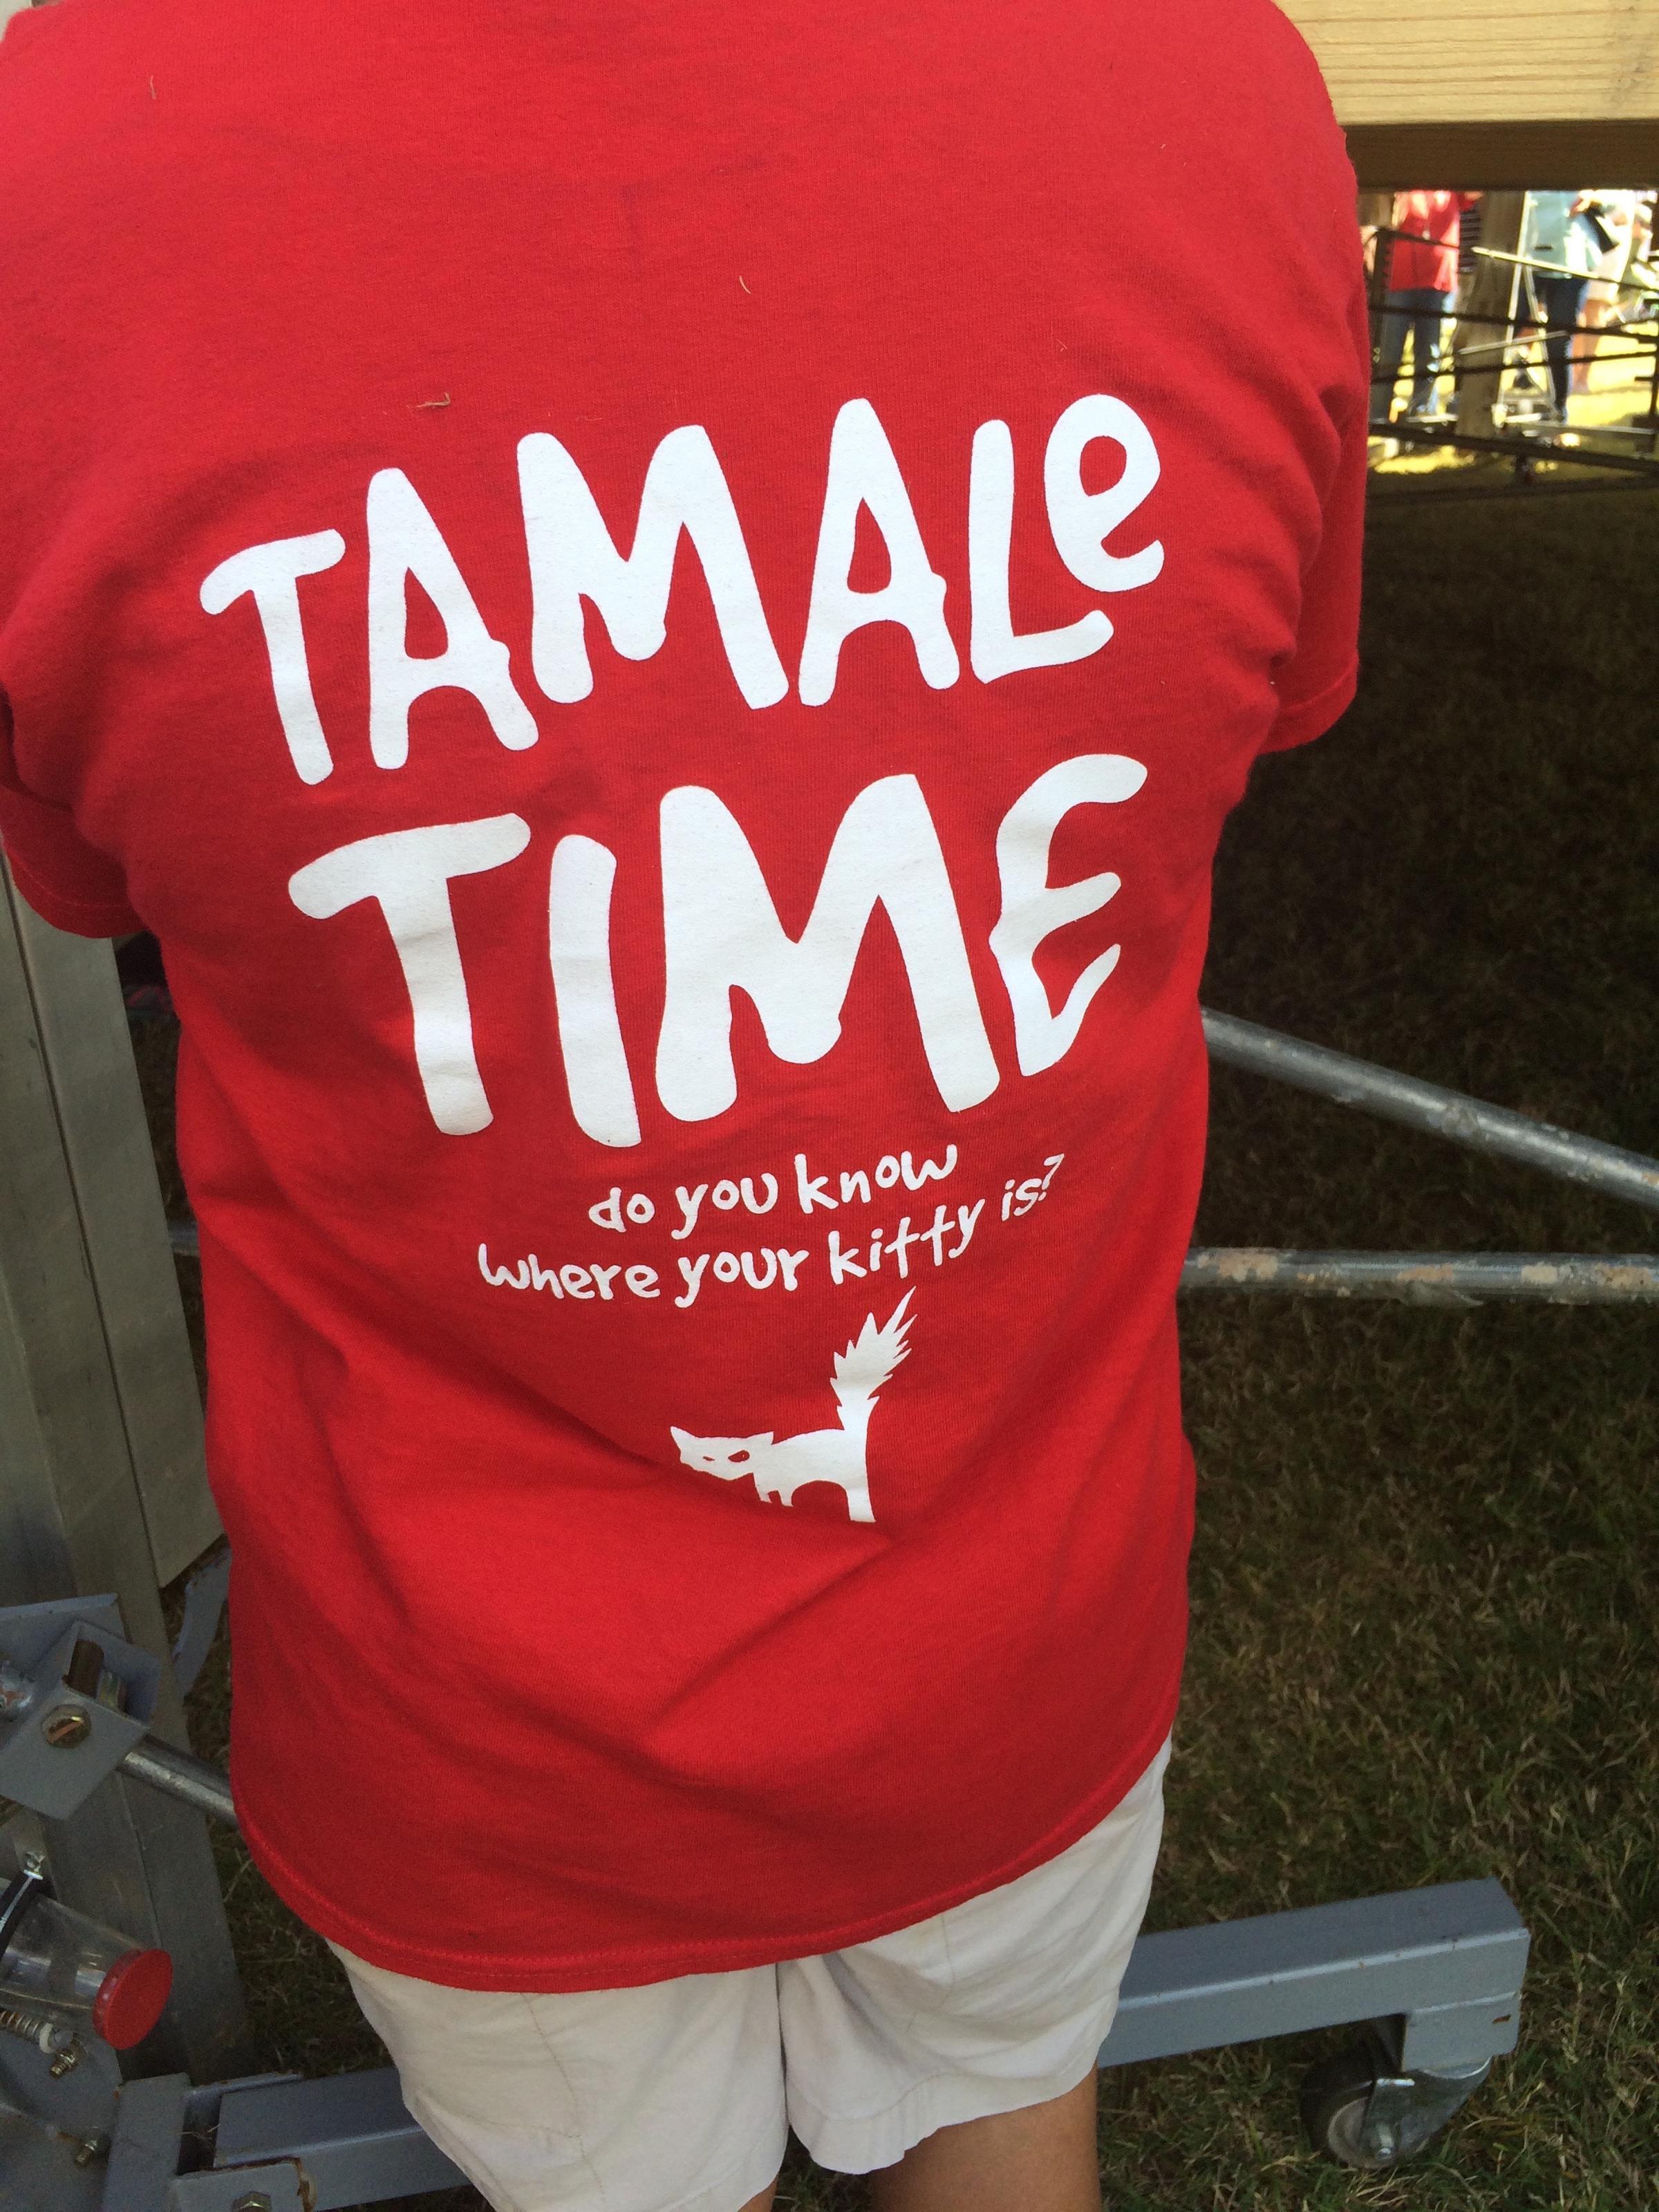 tamale - Copy.jpg